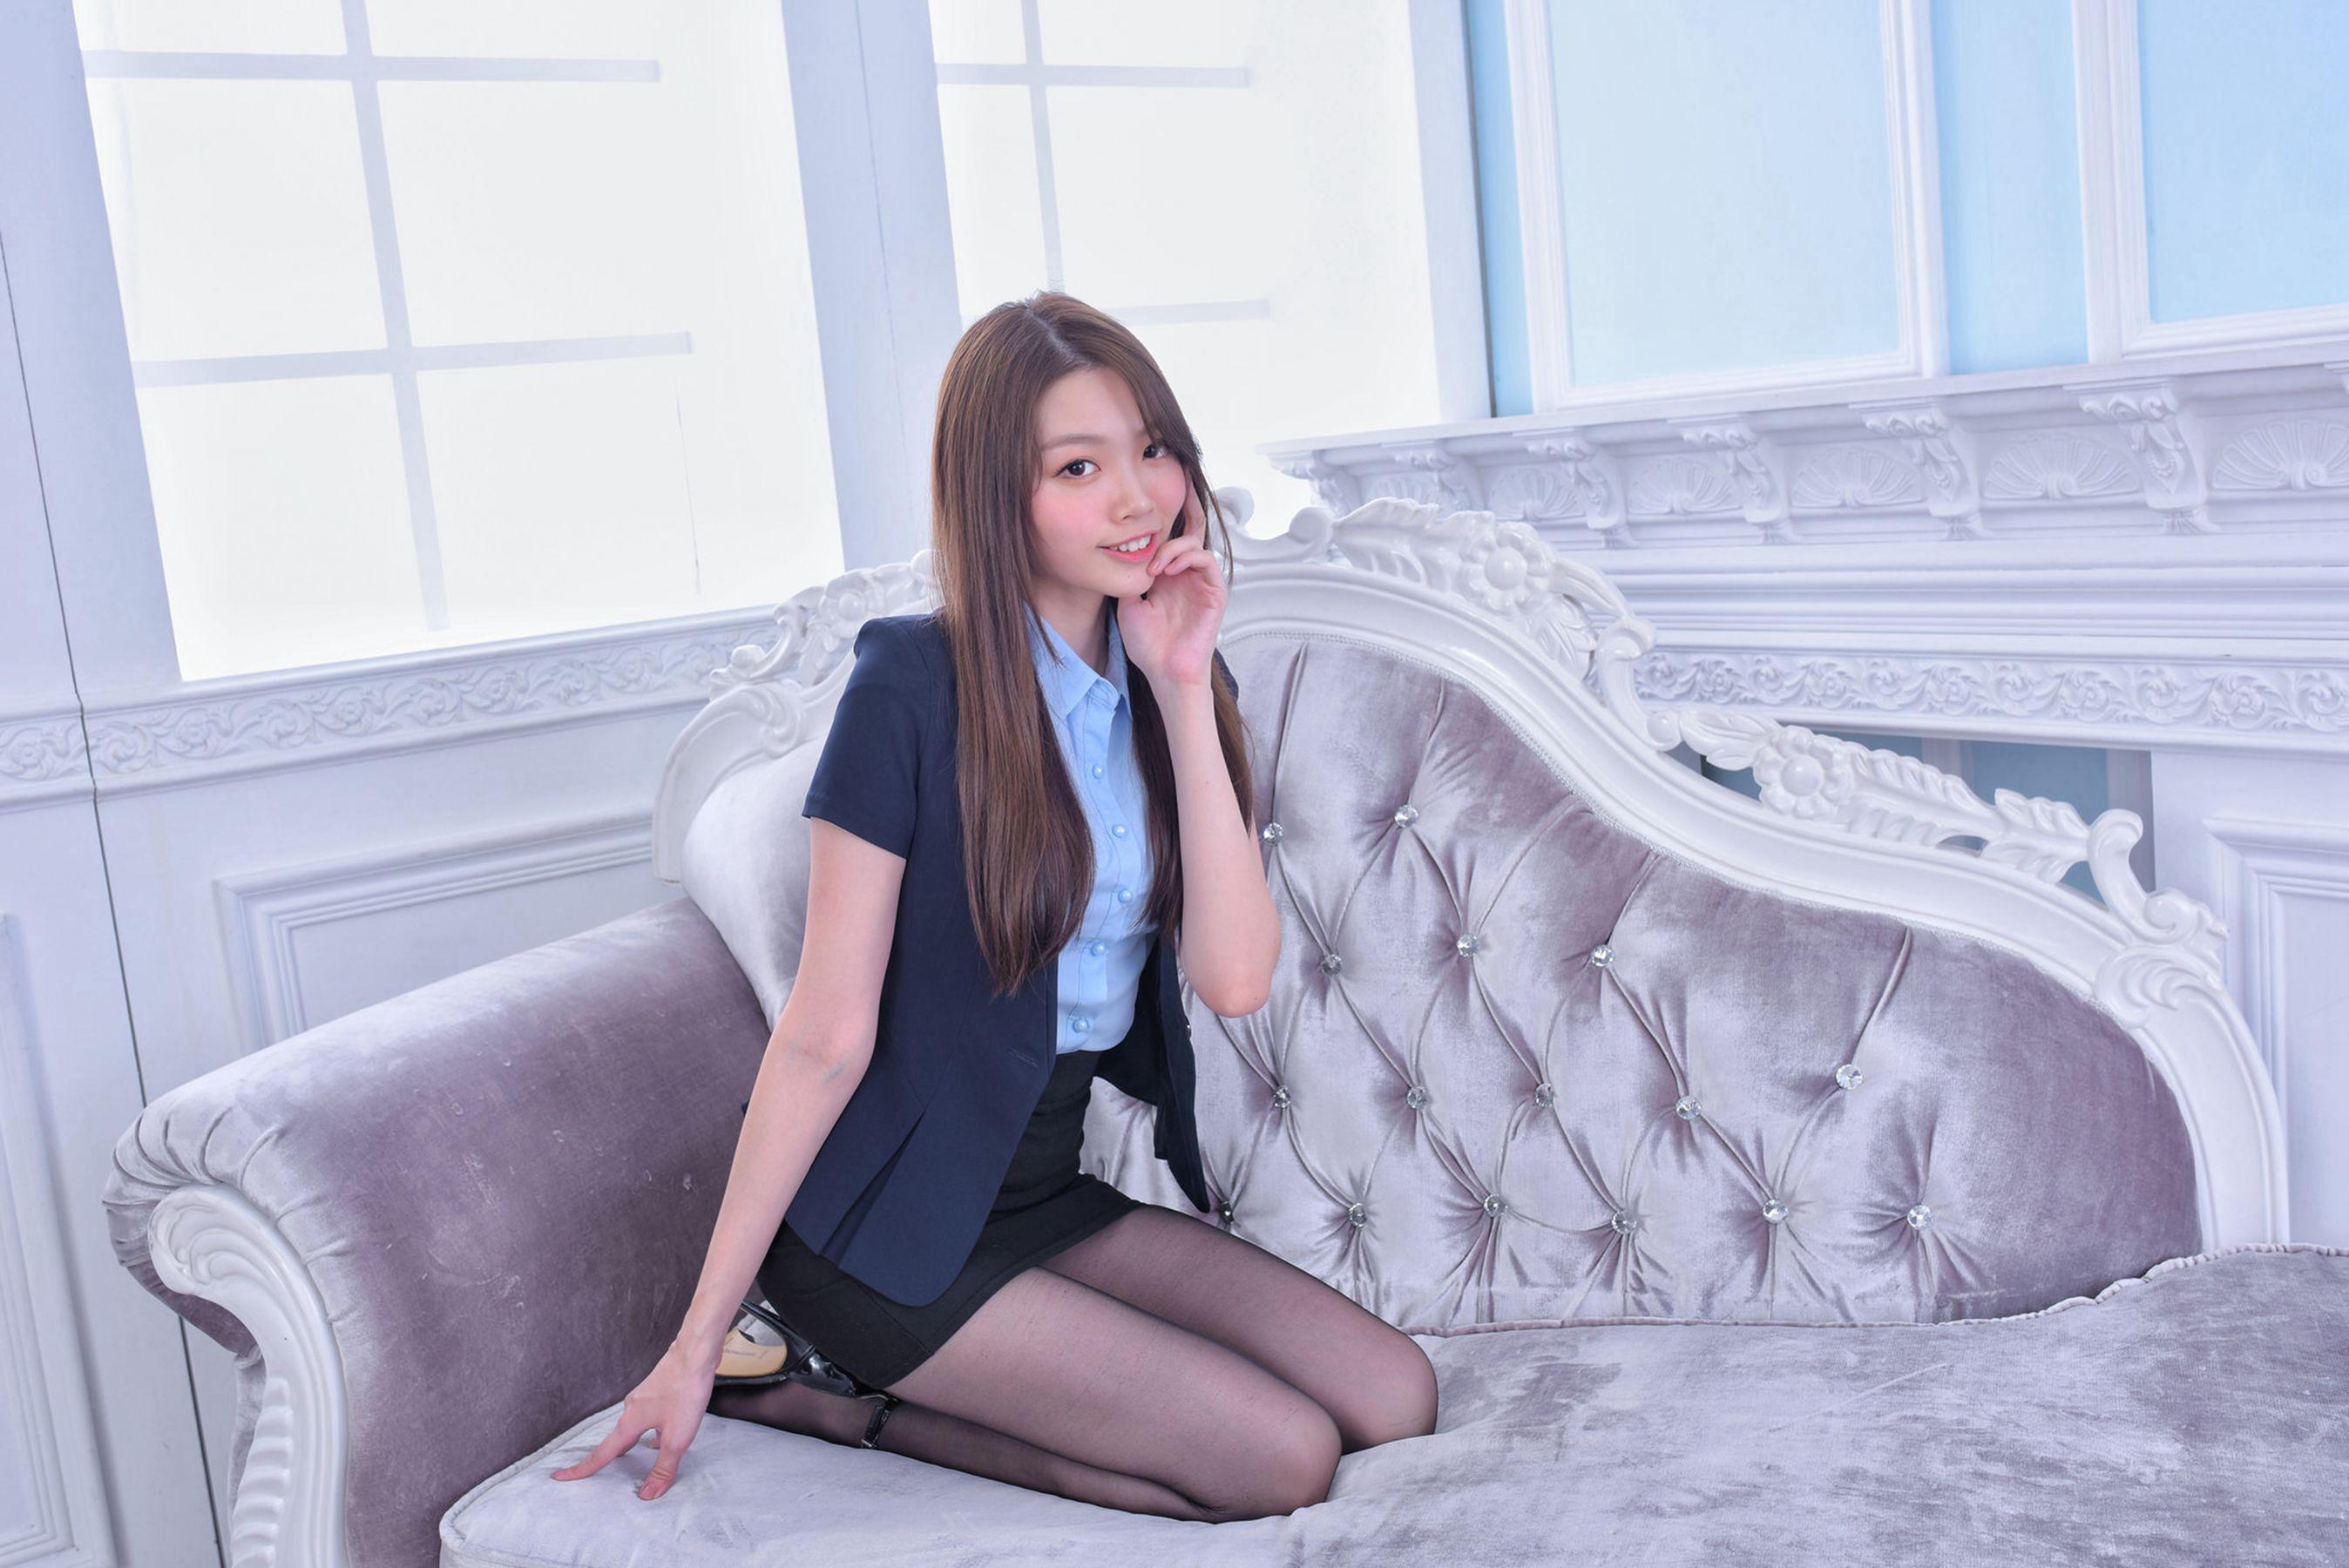 VOL.869 [台湾正妹]黑丝包臀裙美女白领丽人:林少淇超高清个人性感漂亮大图(56P)